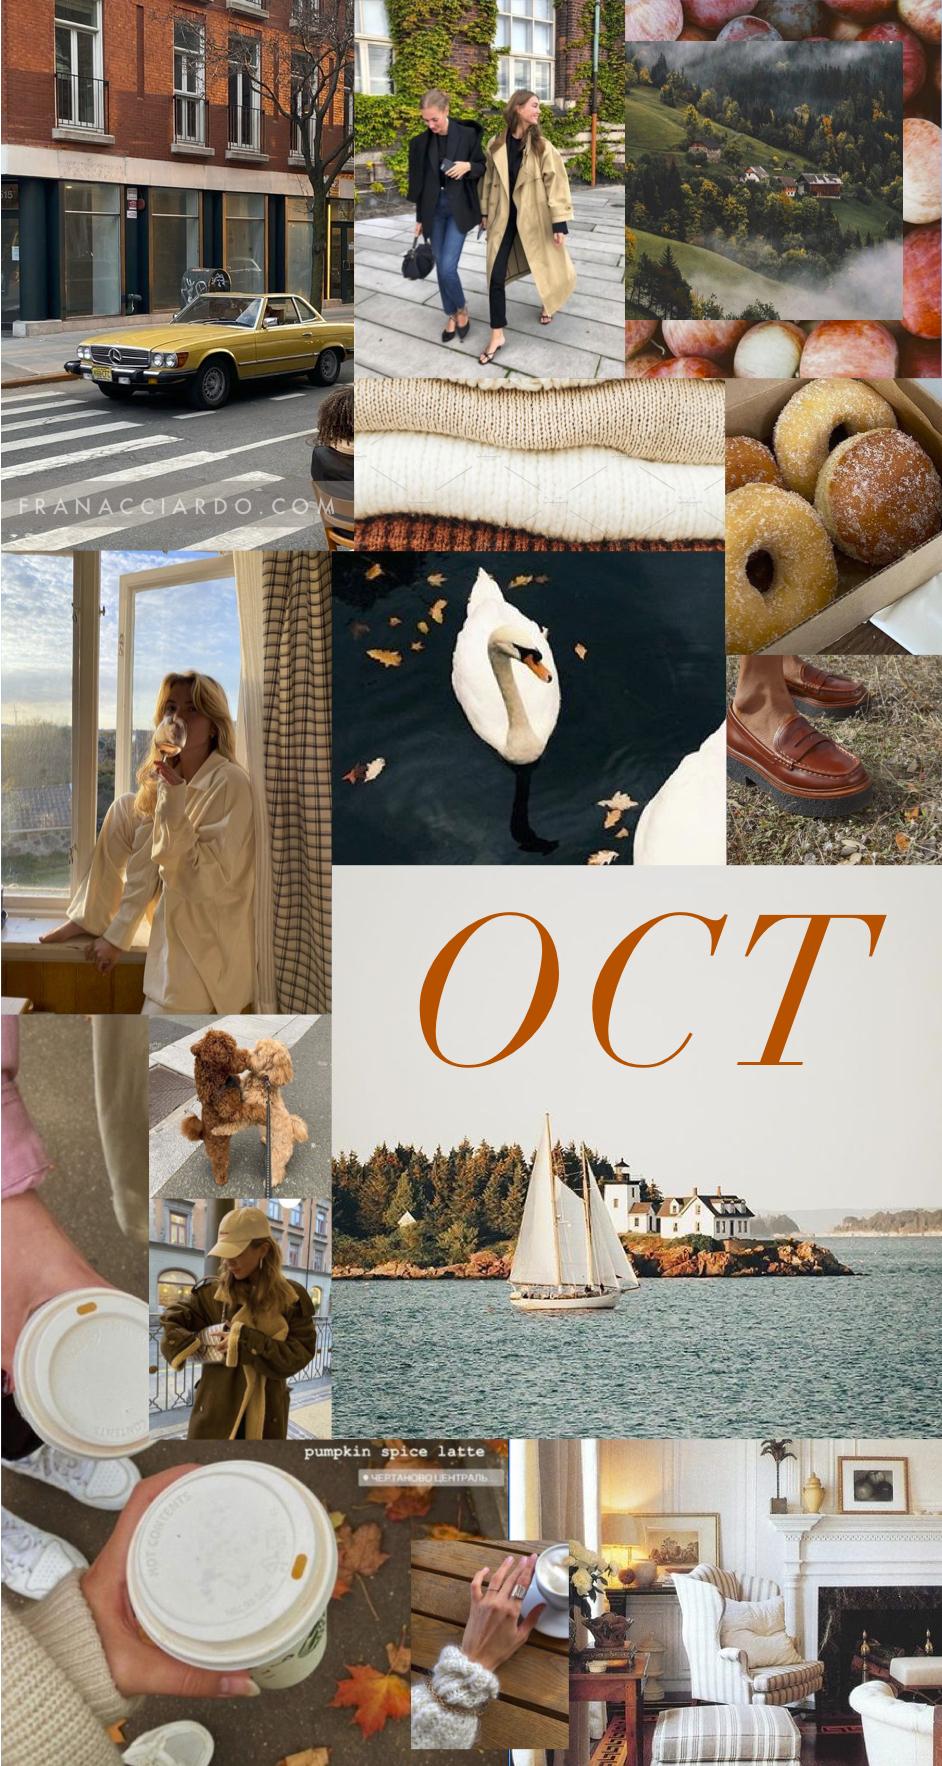 fran acciardo october 2021 mood board fall desktop wallpaper iphone wallpaper autumn october fall aesthetic download